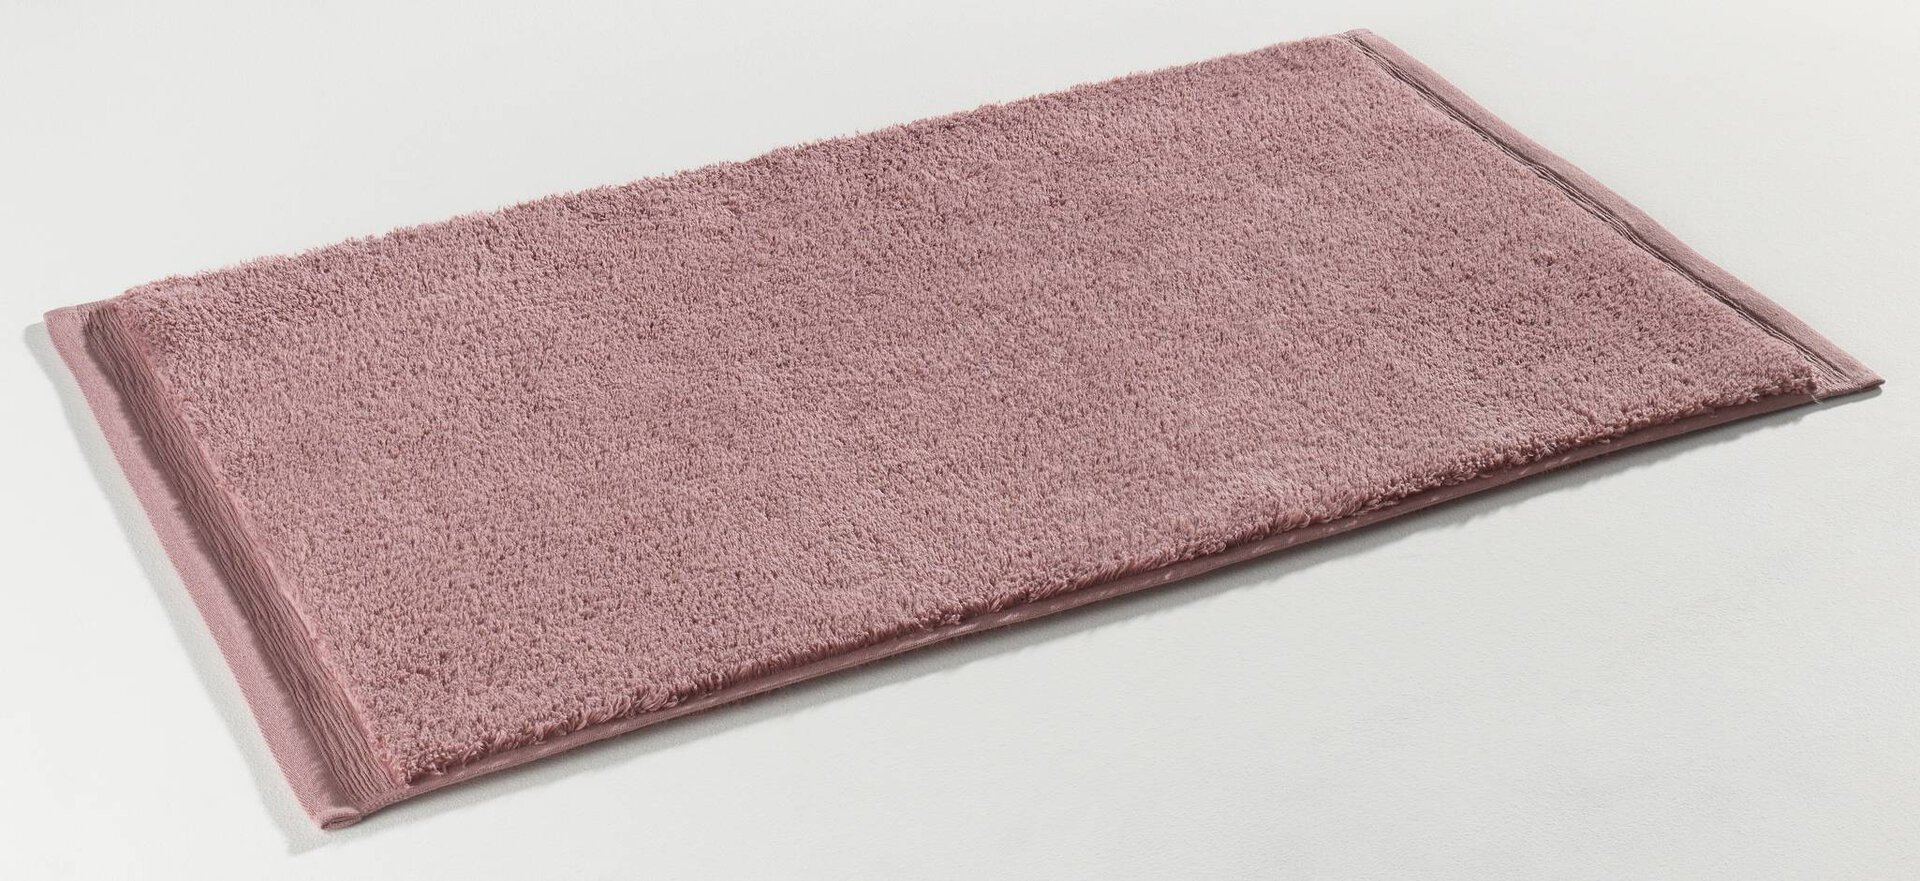 Badteppich Organic Kenborg Textil rosa 50 x 80 cm